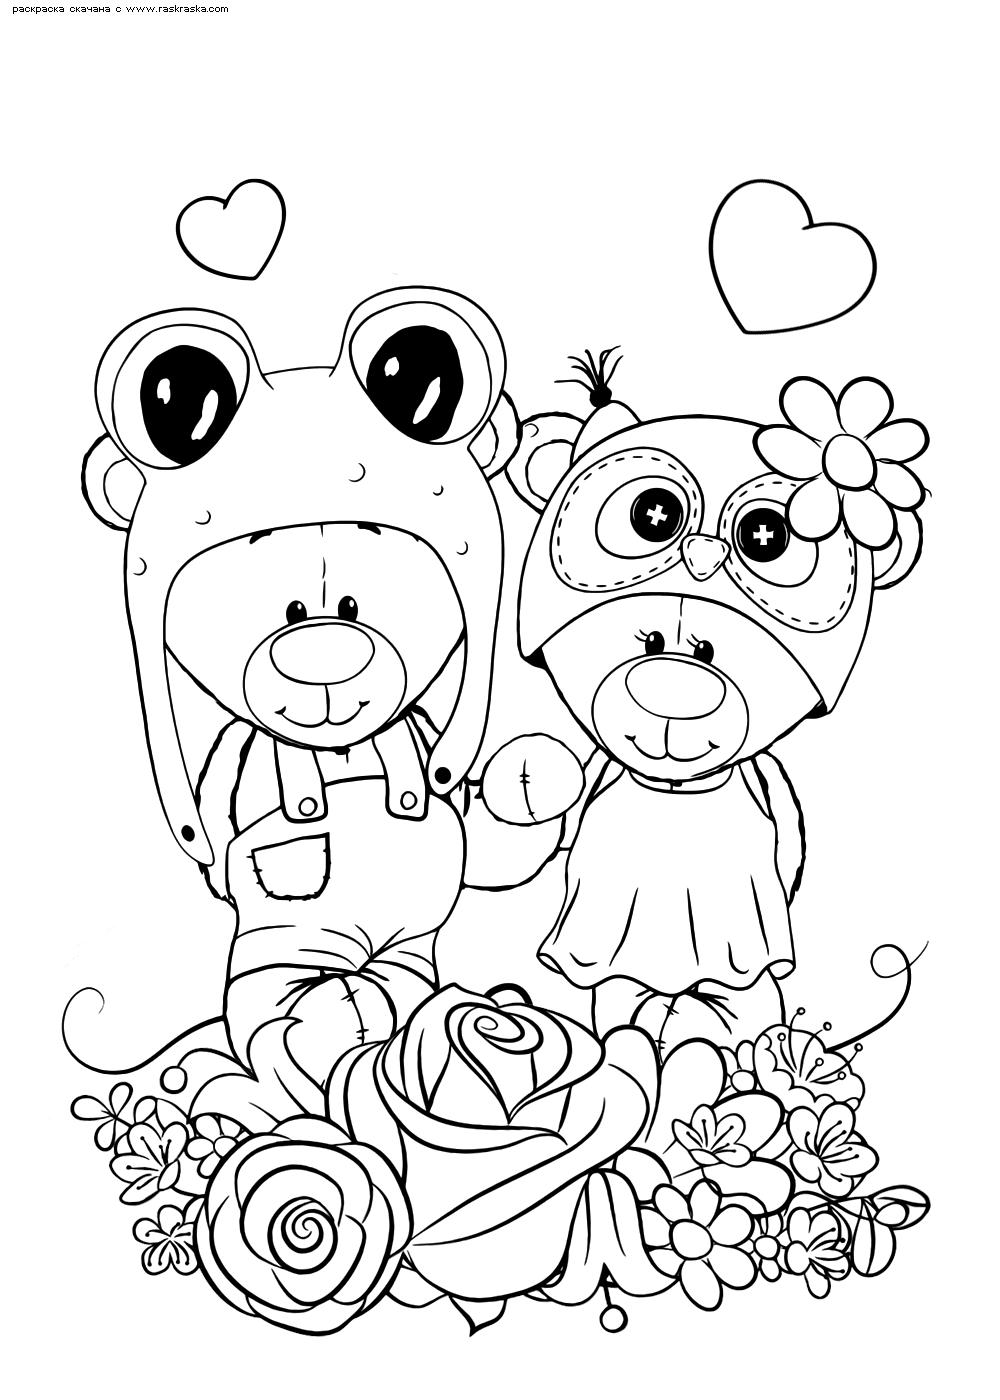 Раскраска Медвежата   Раскраски няшных животных. Милые ...